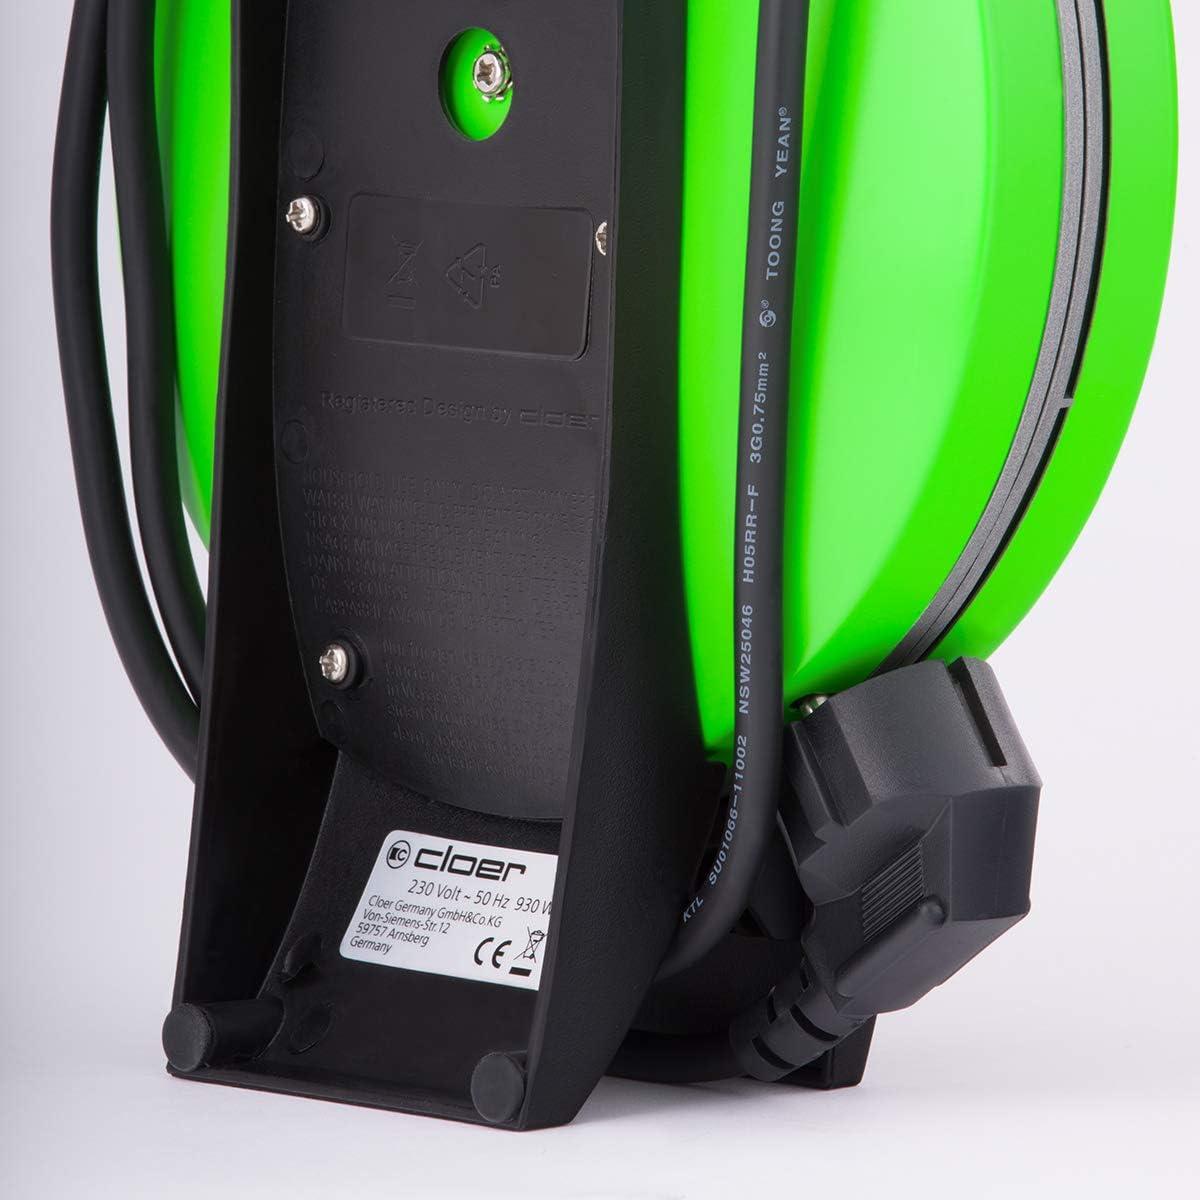 Cloer 1621 Machine à Gaufres Automatique Blanc Vert